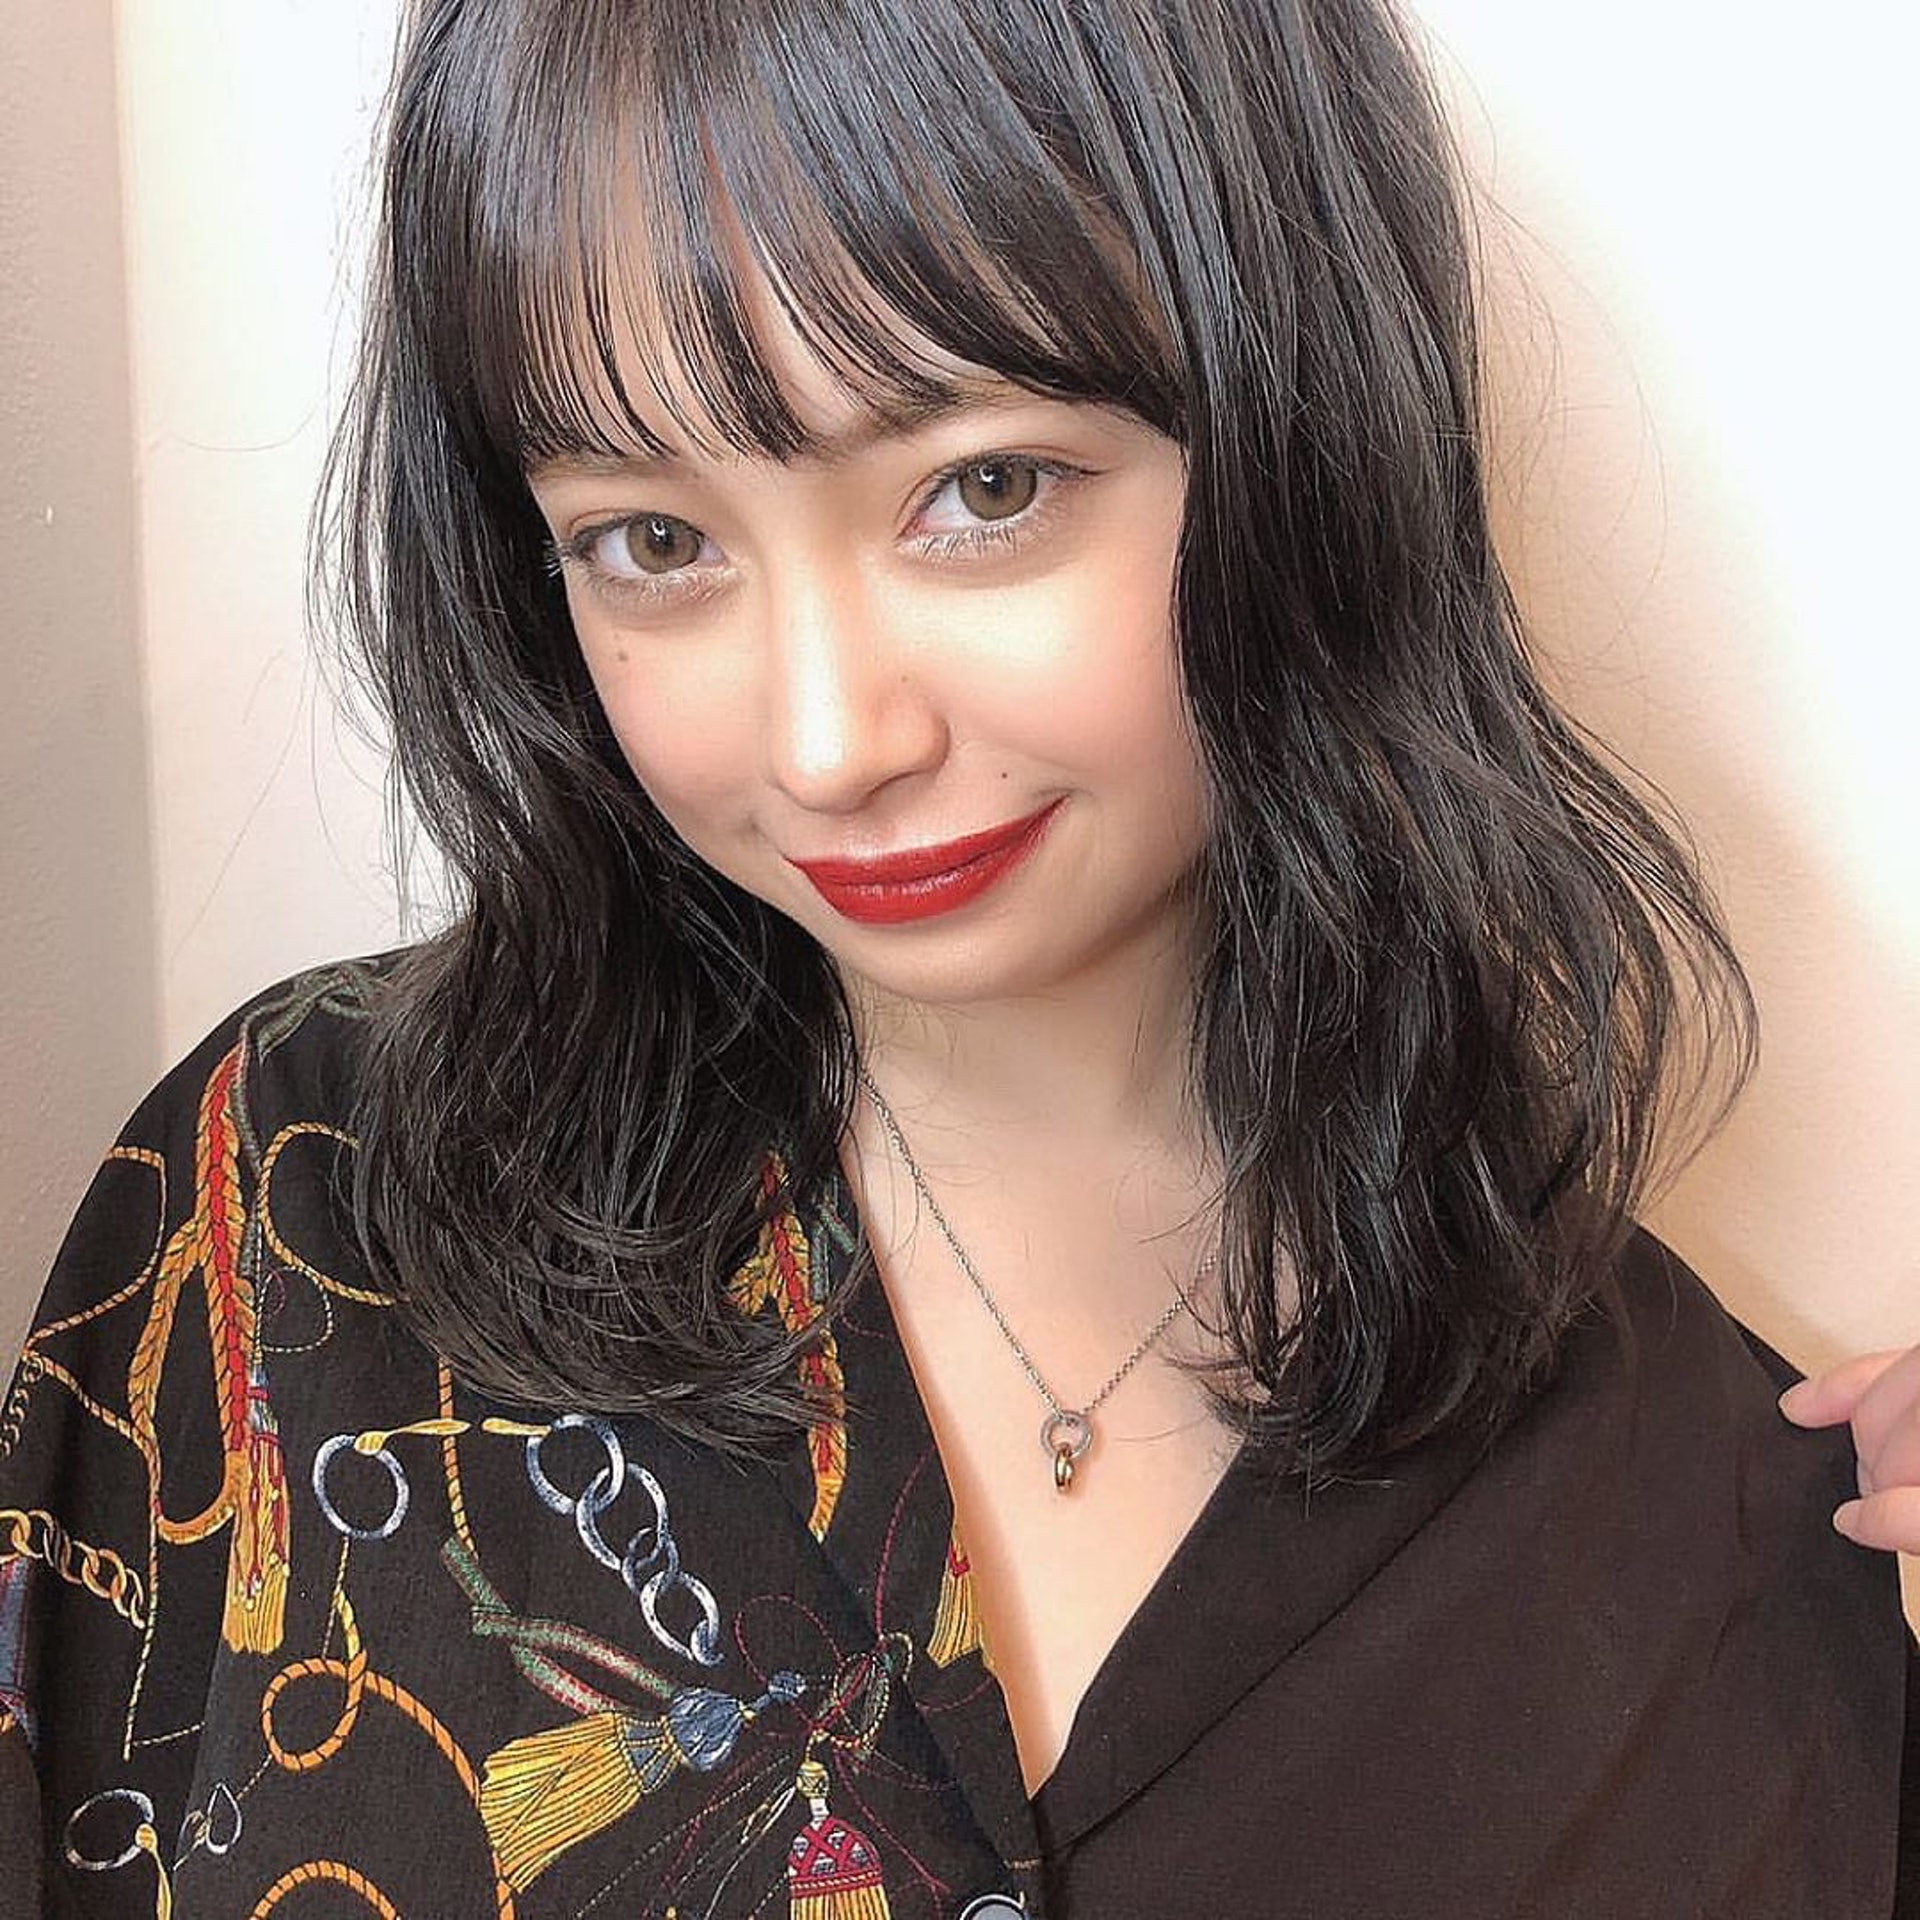 愛子外貌甜美。(IG@aikoo__desu)